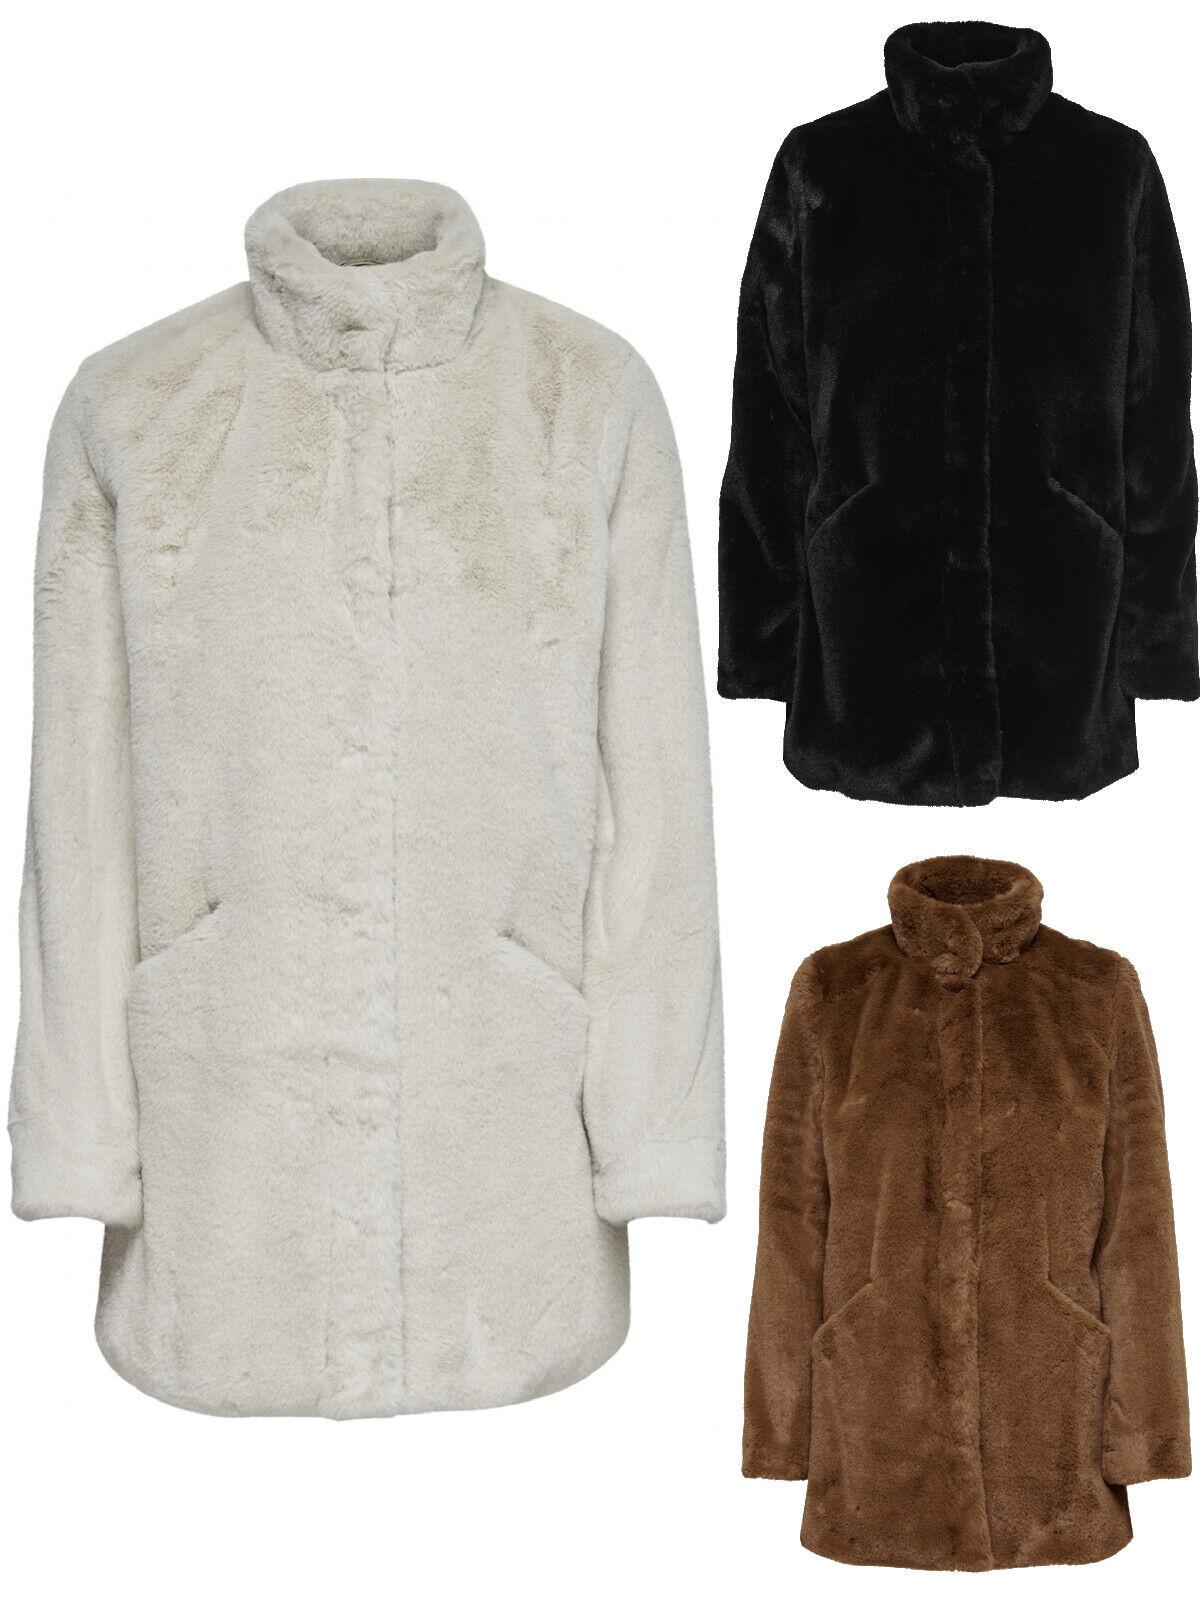 Only Damen Kunstfell Mantel Weste Jacke aus weichem Teddy Fell mit Stehkragen